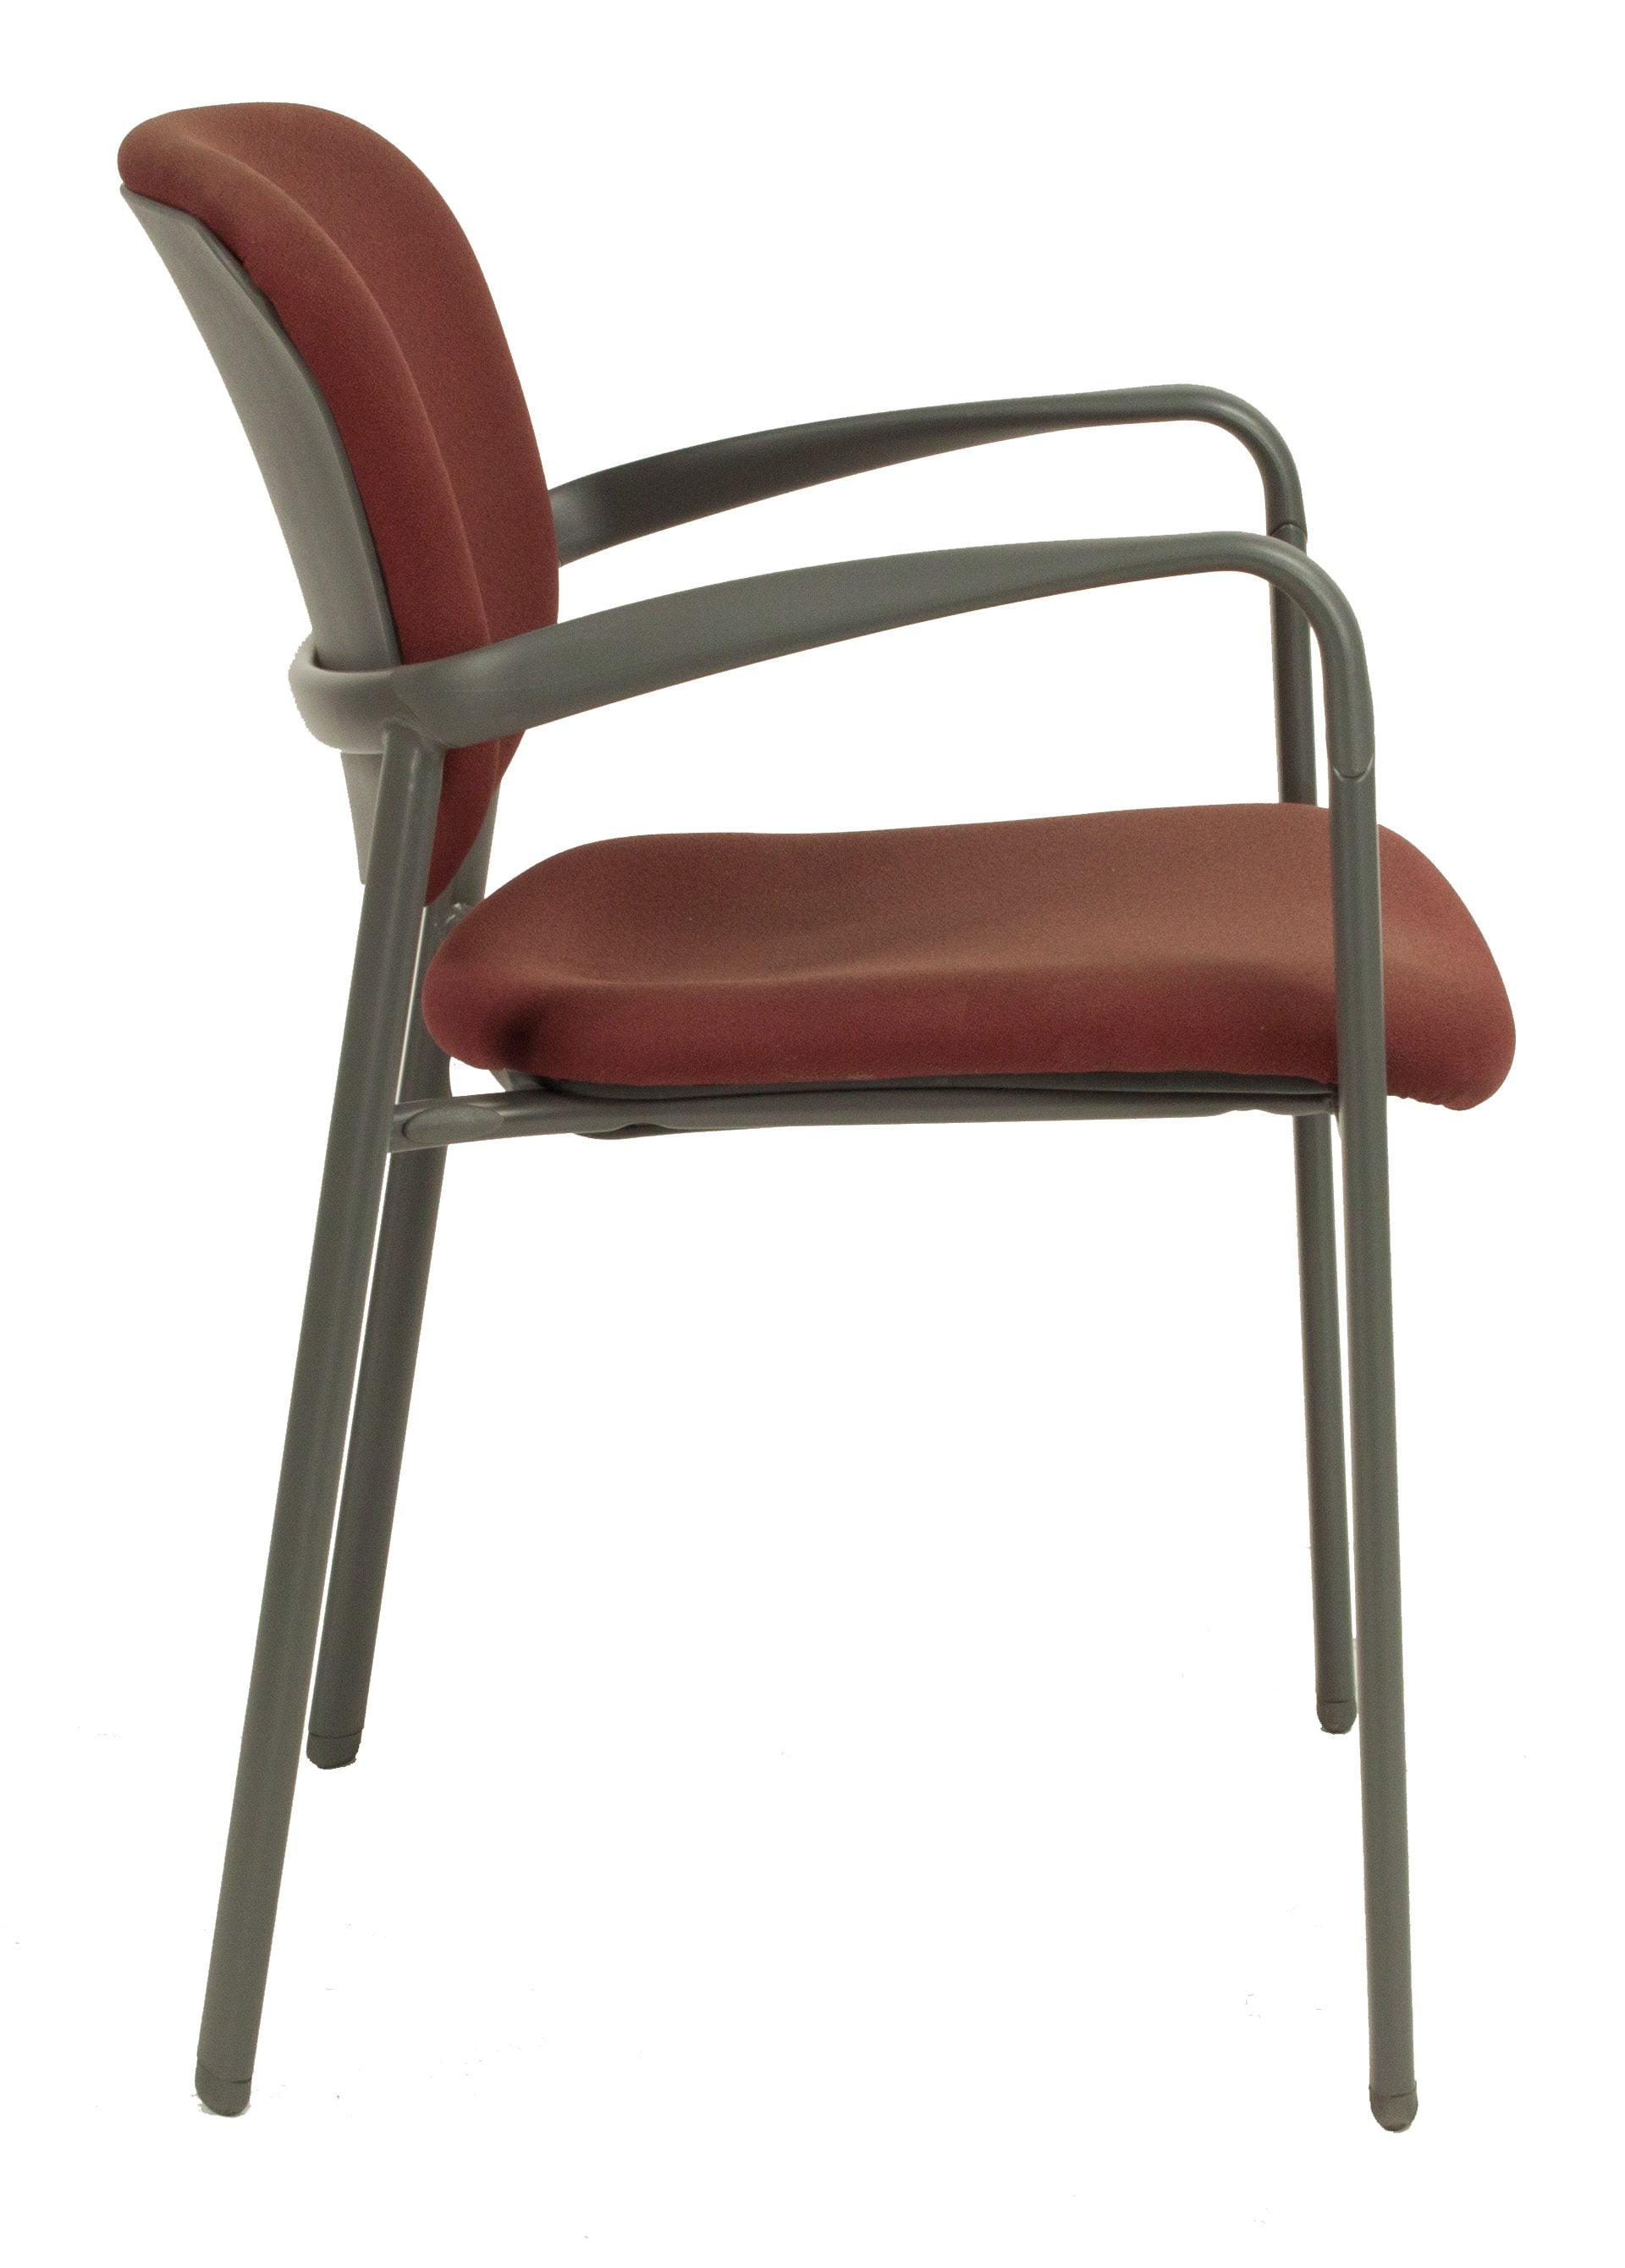 Haworth Improv Chairs Home Design 2017